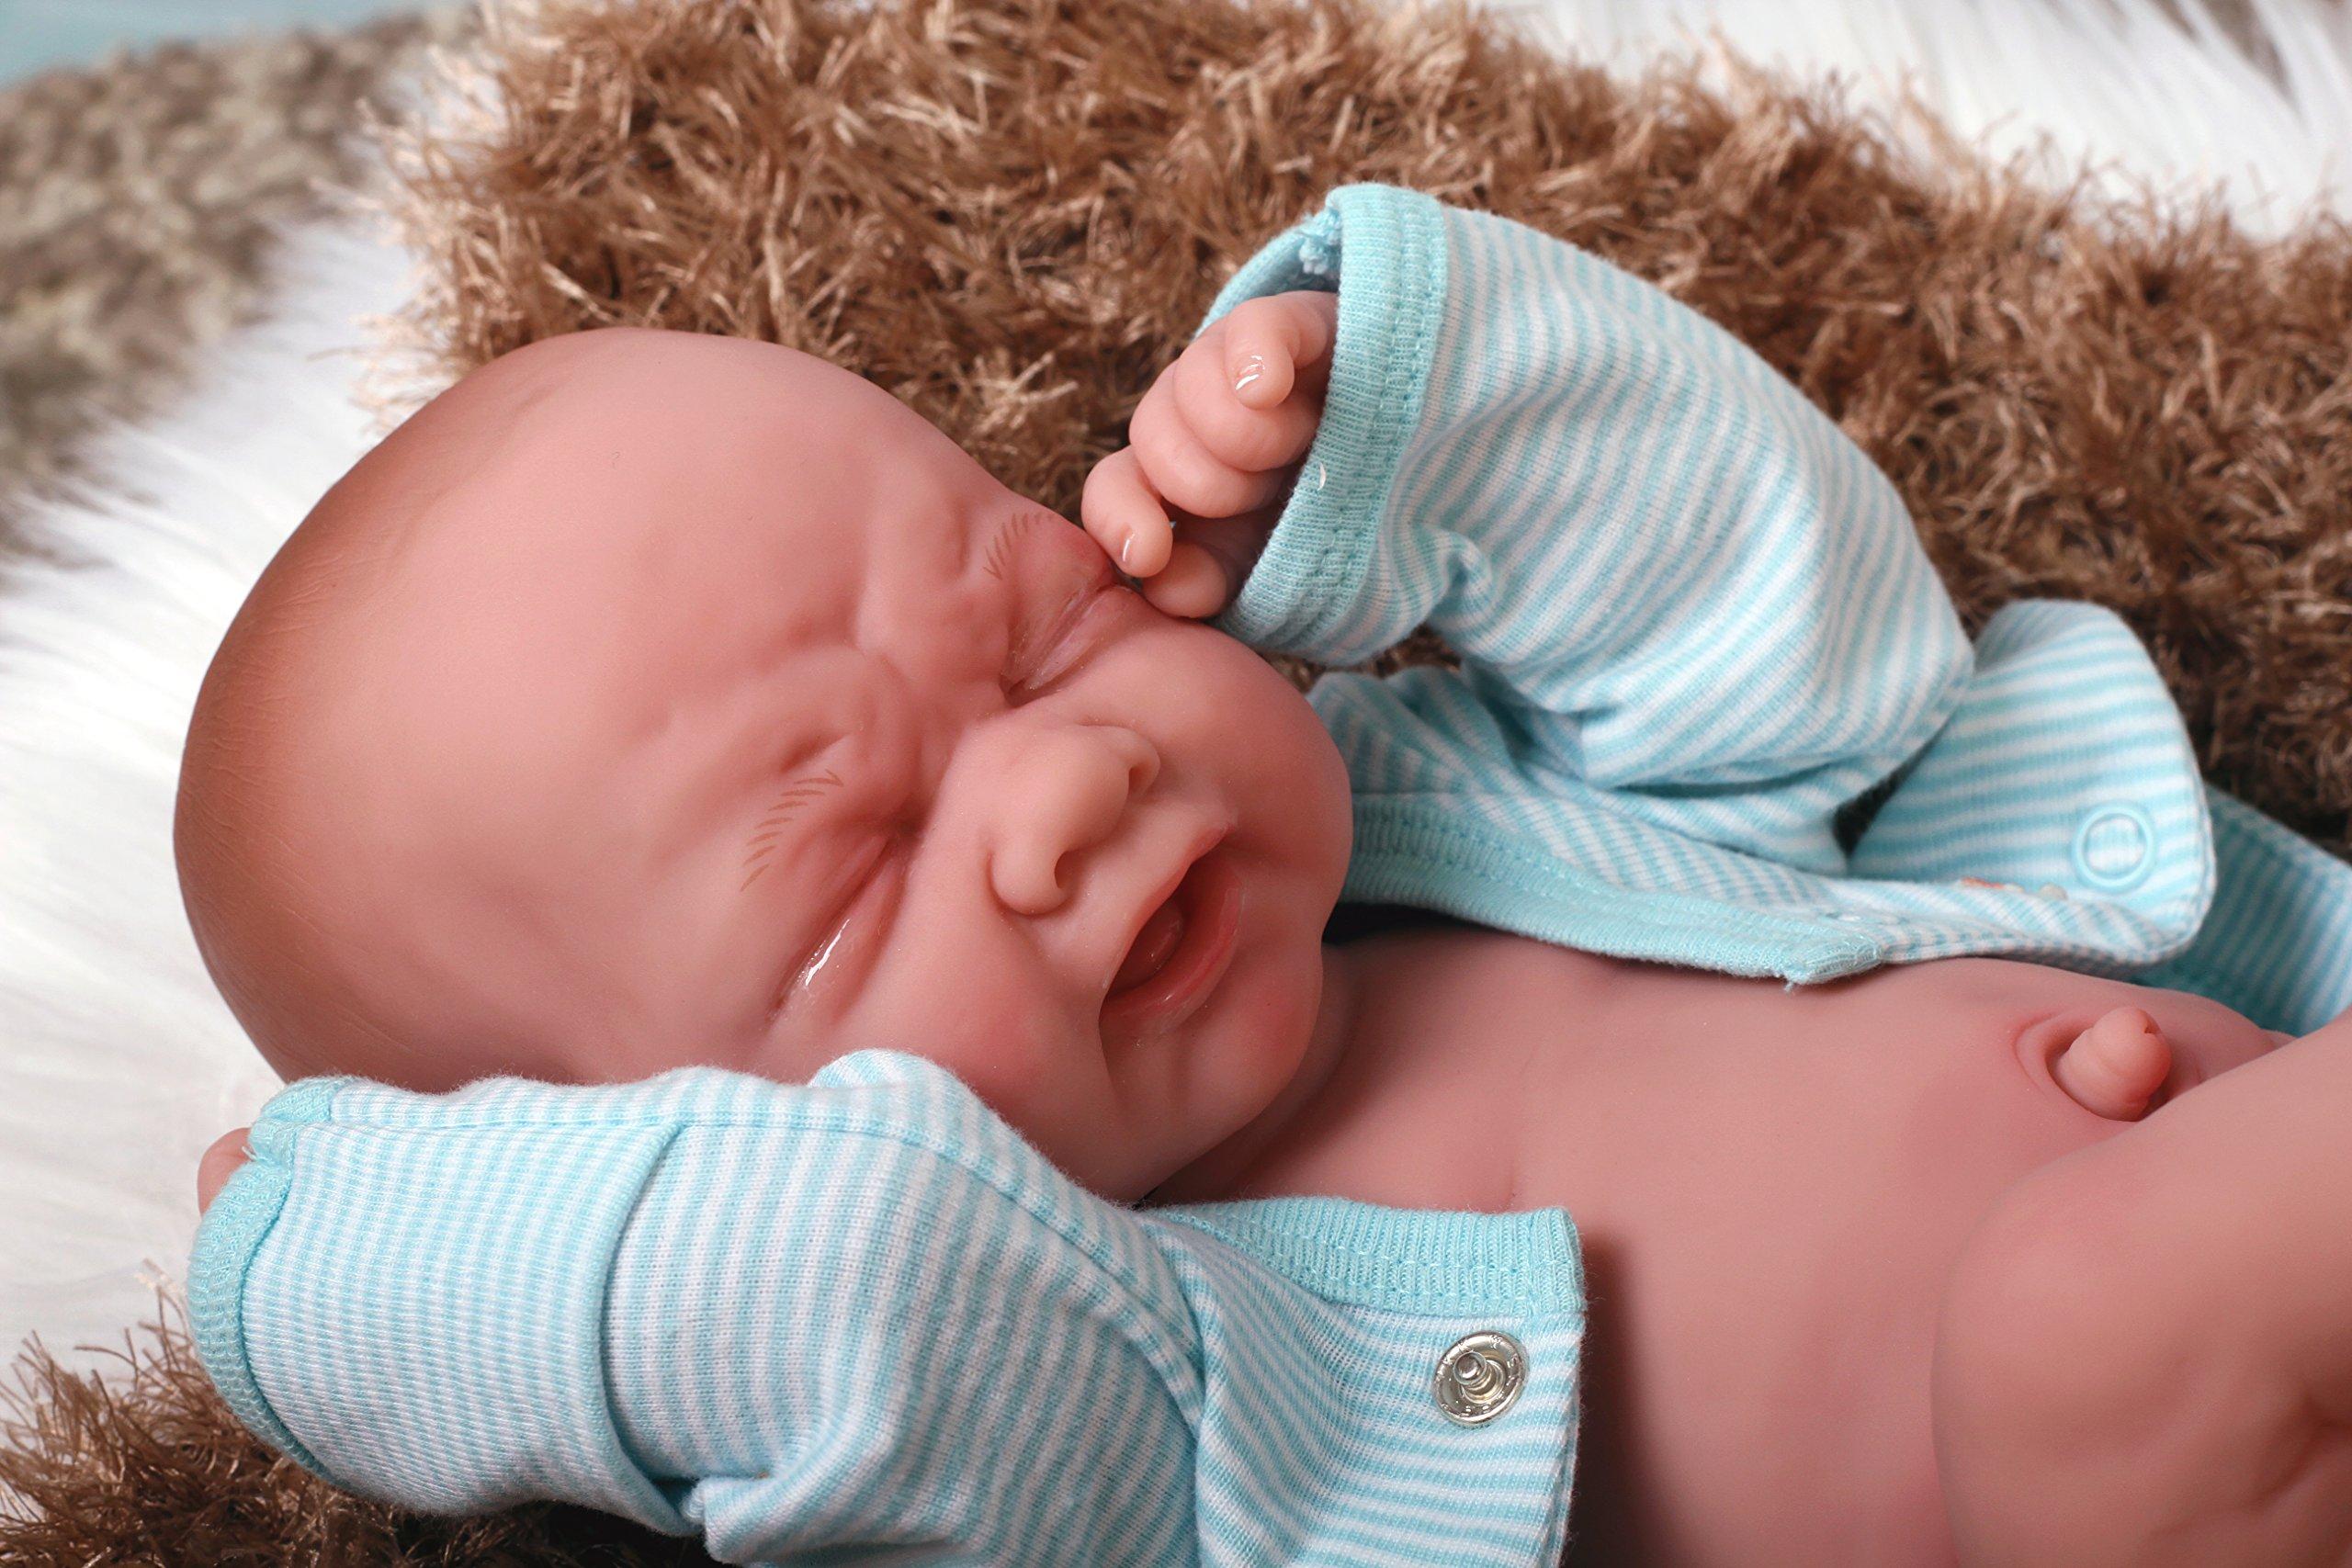 Baby BOY so precious Crying Preemie Berenguer Life Like Reborn Pacifier Doll +Extras accessories muñeco vinilo suave poupee souple en vinyle puppe